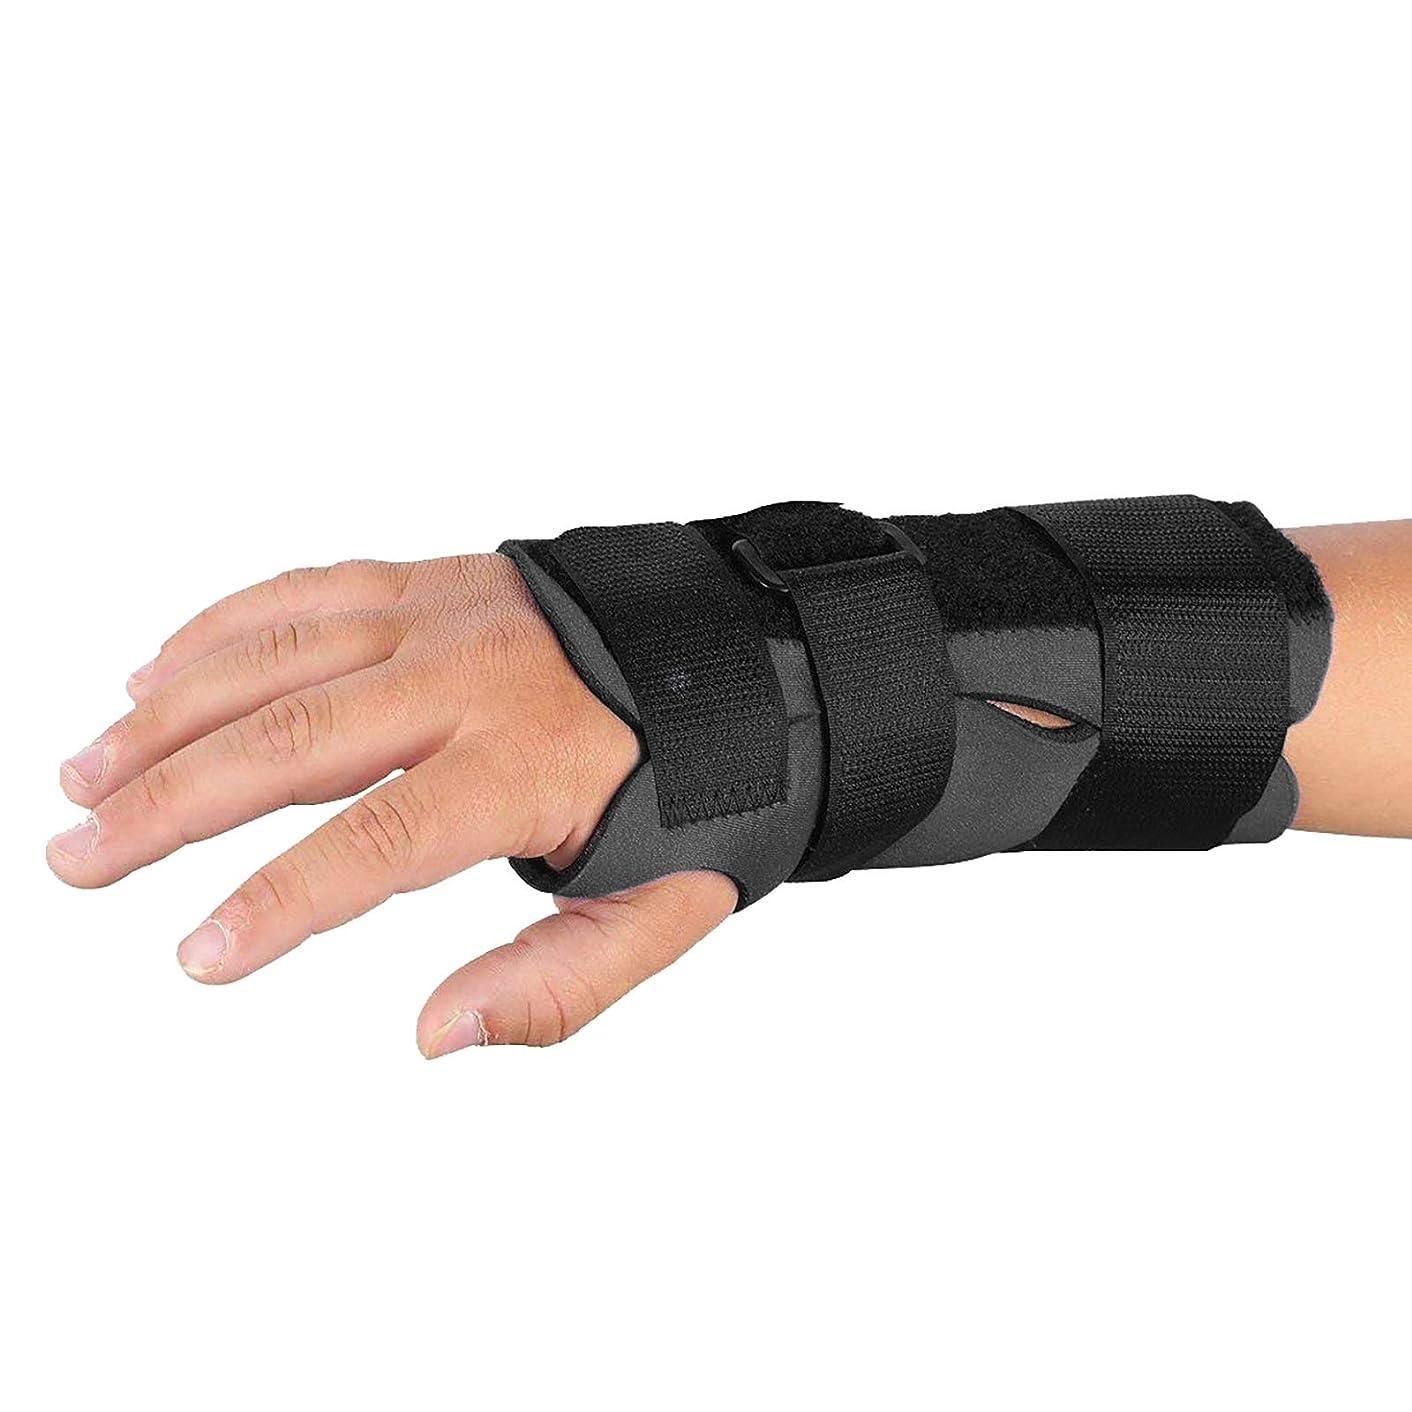 Sammons Preston Breathoprene Pediatric Wrist Splint, Right, X-Small, Orthopedic Support Brace for Tendonitis, Inflammation, Carpal Tunnel, Thumb Injuries & Pain, Breathable & Comfortable Compression